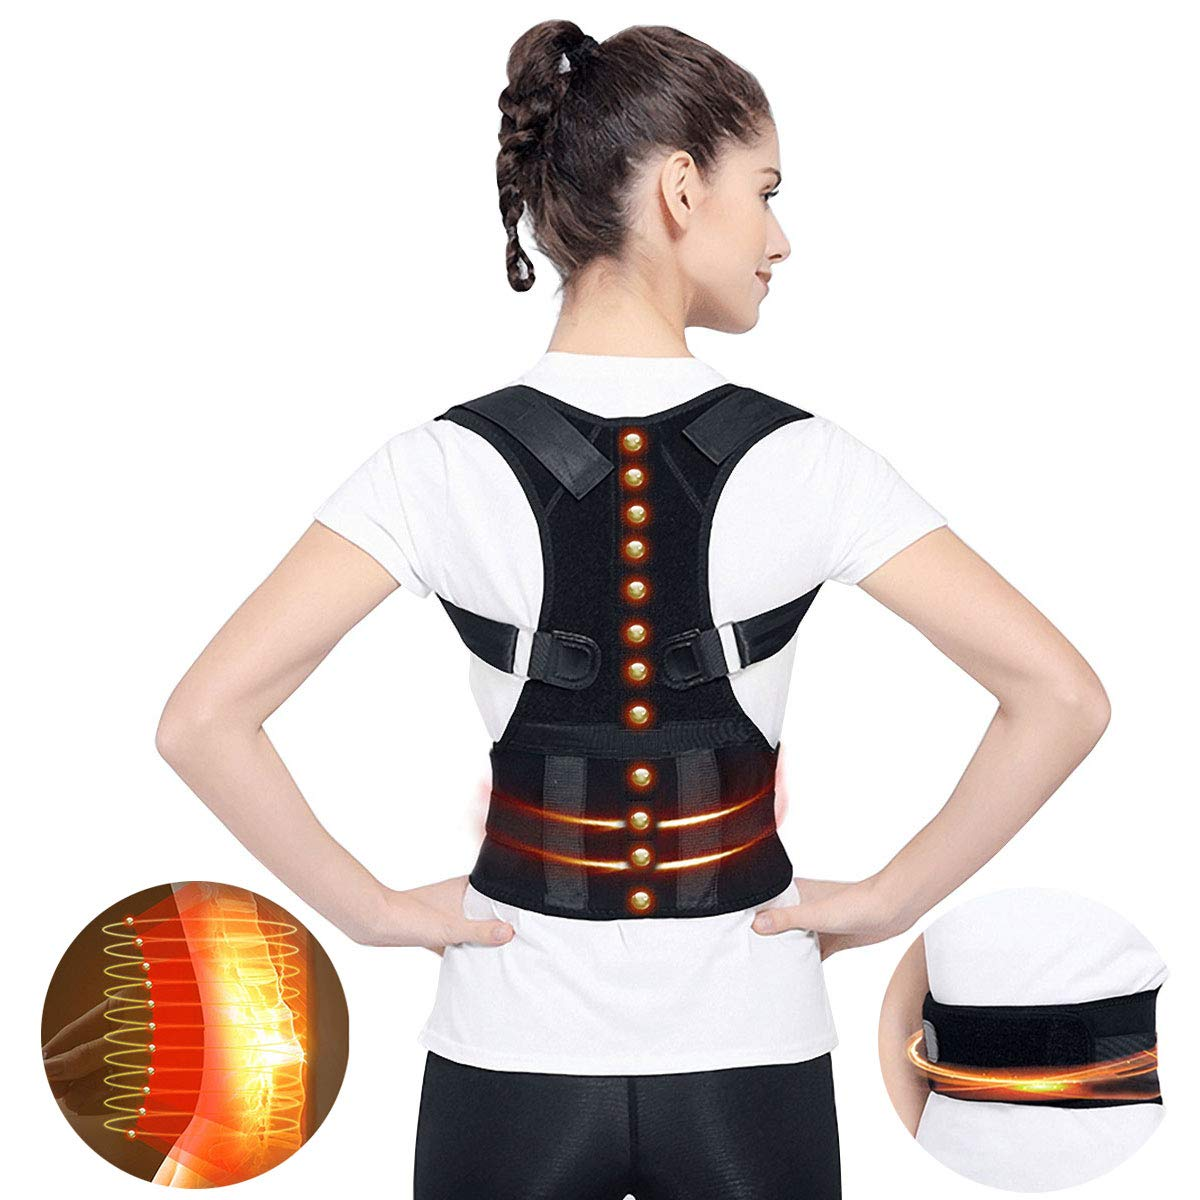 Magnetic Therapy Posture Support Back Brace, Medical Adjustable Posture Humpback Corrector Brace Straighten and Correct Posture Upper Shoulder Waist Lumbar Support Belt Relieves Neck Back Spine Pain